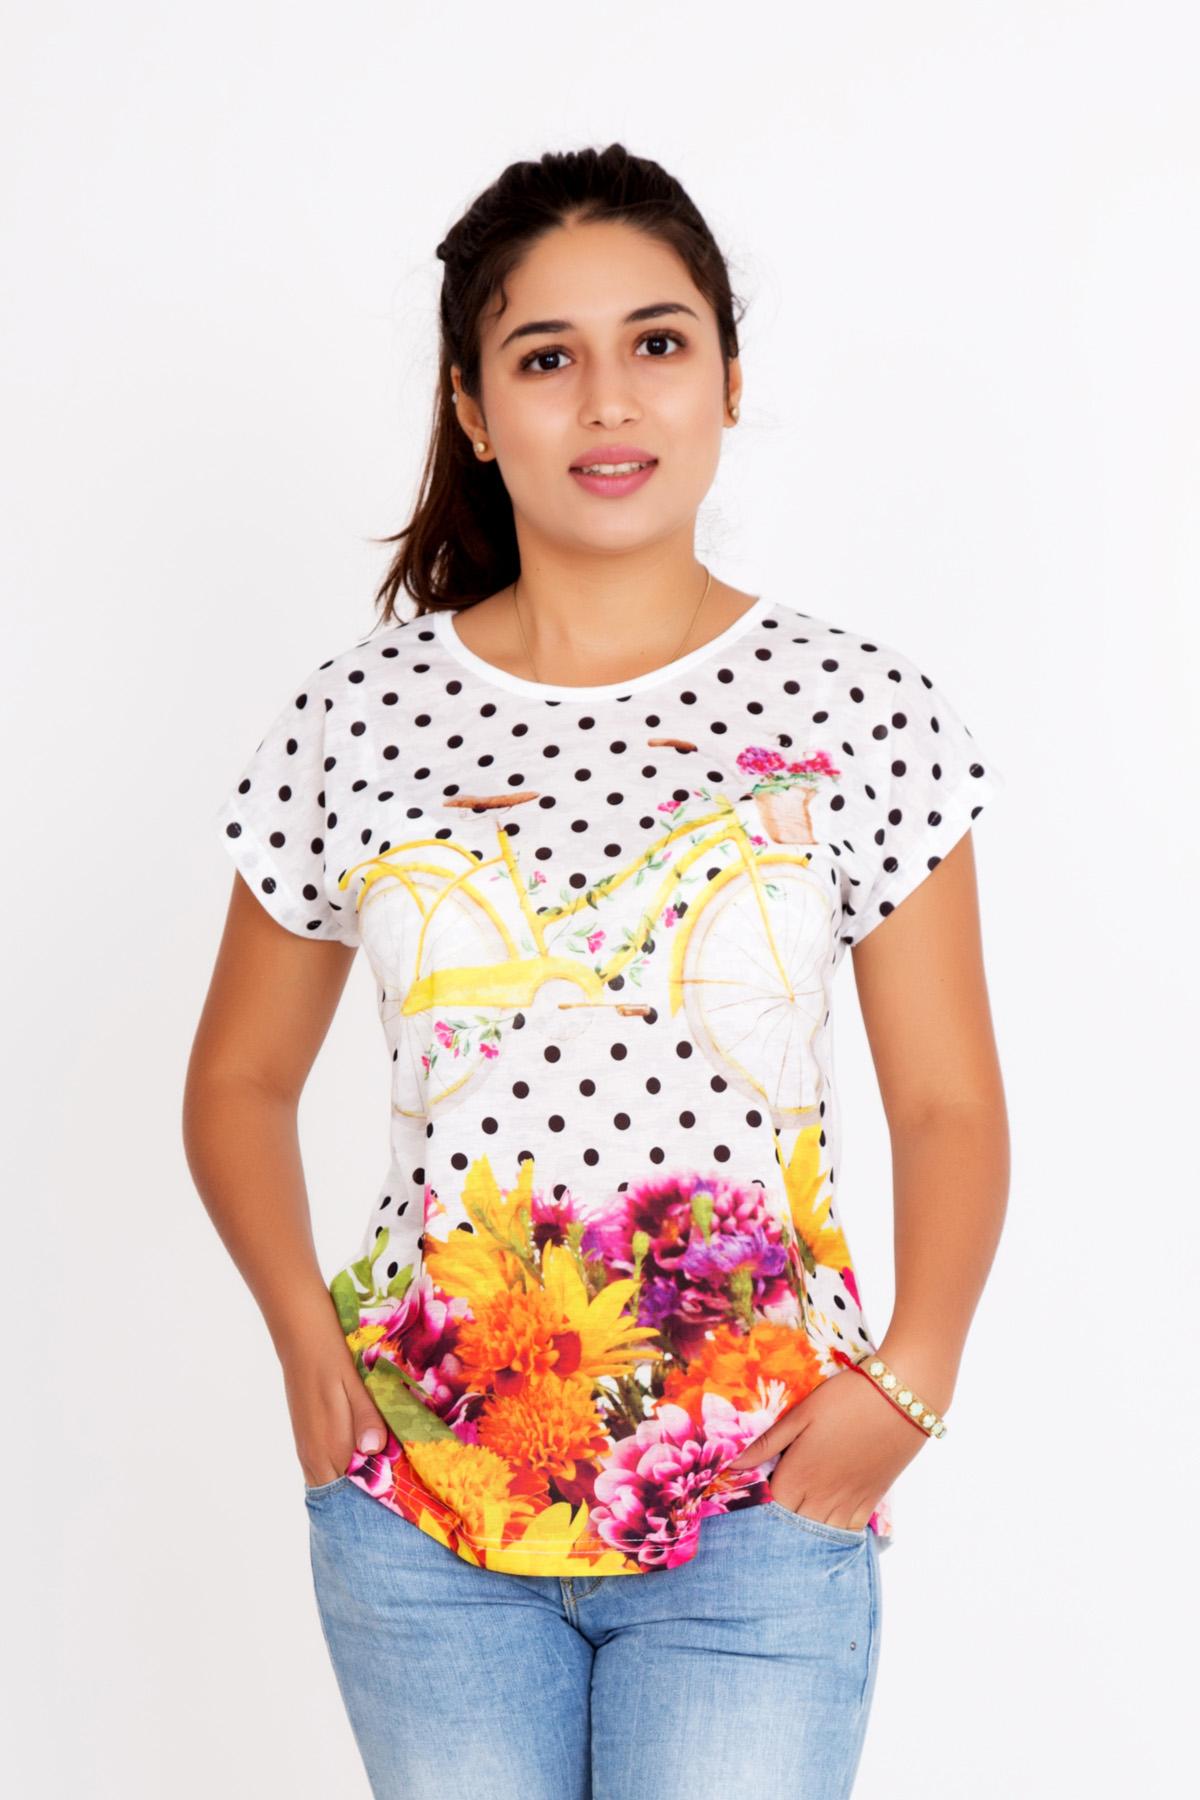 Жен. футболка Прованс р. 44Блузки, майки, кофты<br>Обхват груди:88 см<br>Обхват талии:68 см<br>Обхват бедер:96 см<br>Длина по спинке:65 см<br>Рост:167 см<br><br>Тип: Жен. футболка<br>Размер: 44<br>Материал: Хлопок